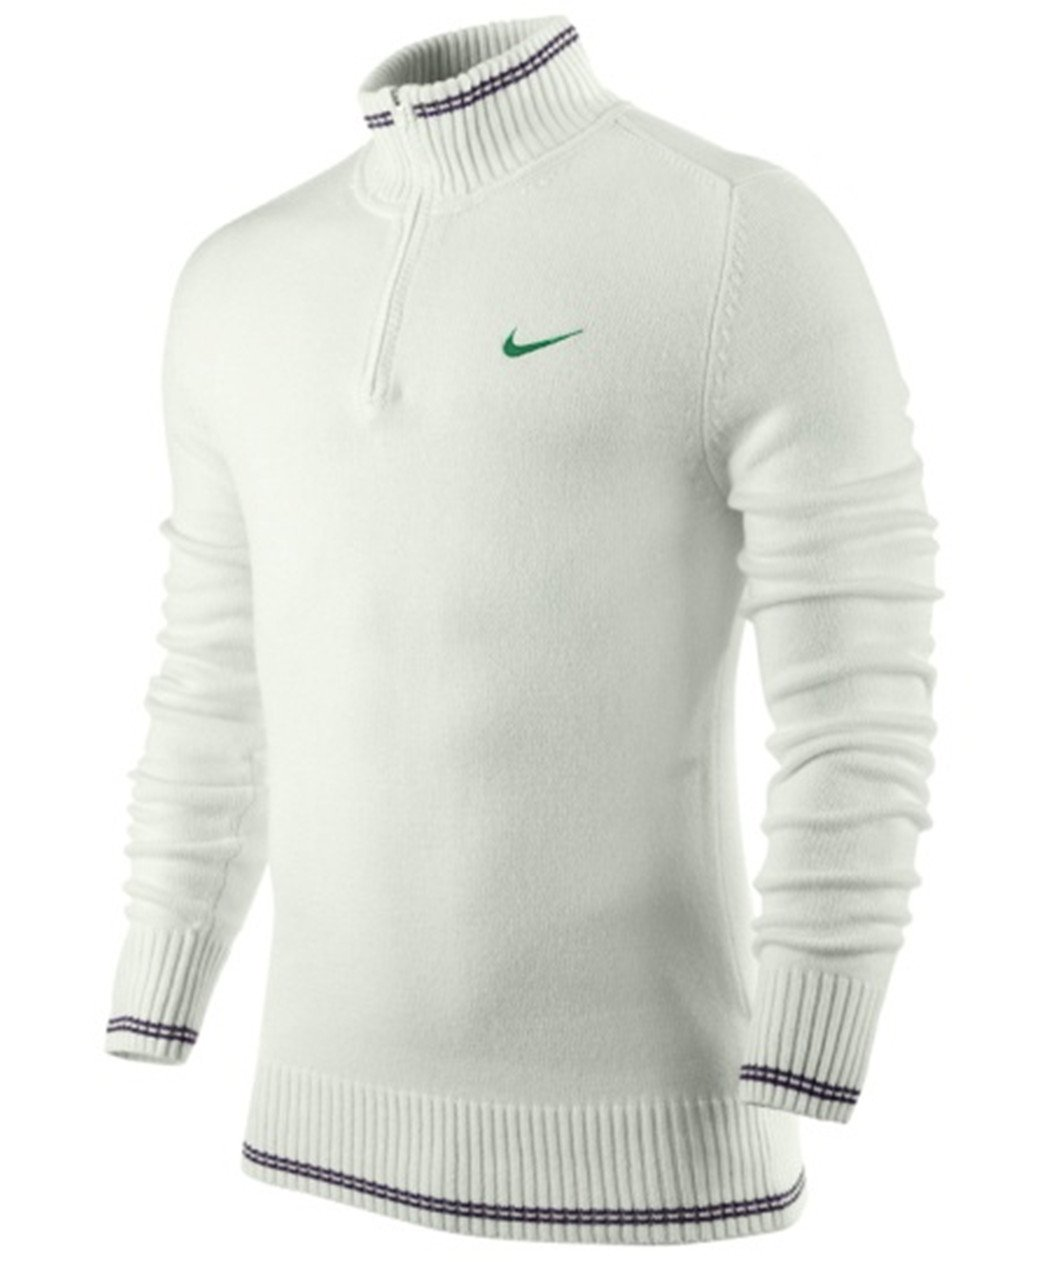 Nike Roger Federer 2012 Wimbledon chmapion RF Tenis Jersey edición ...